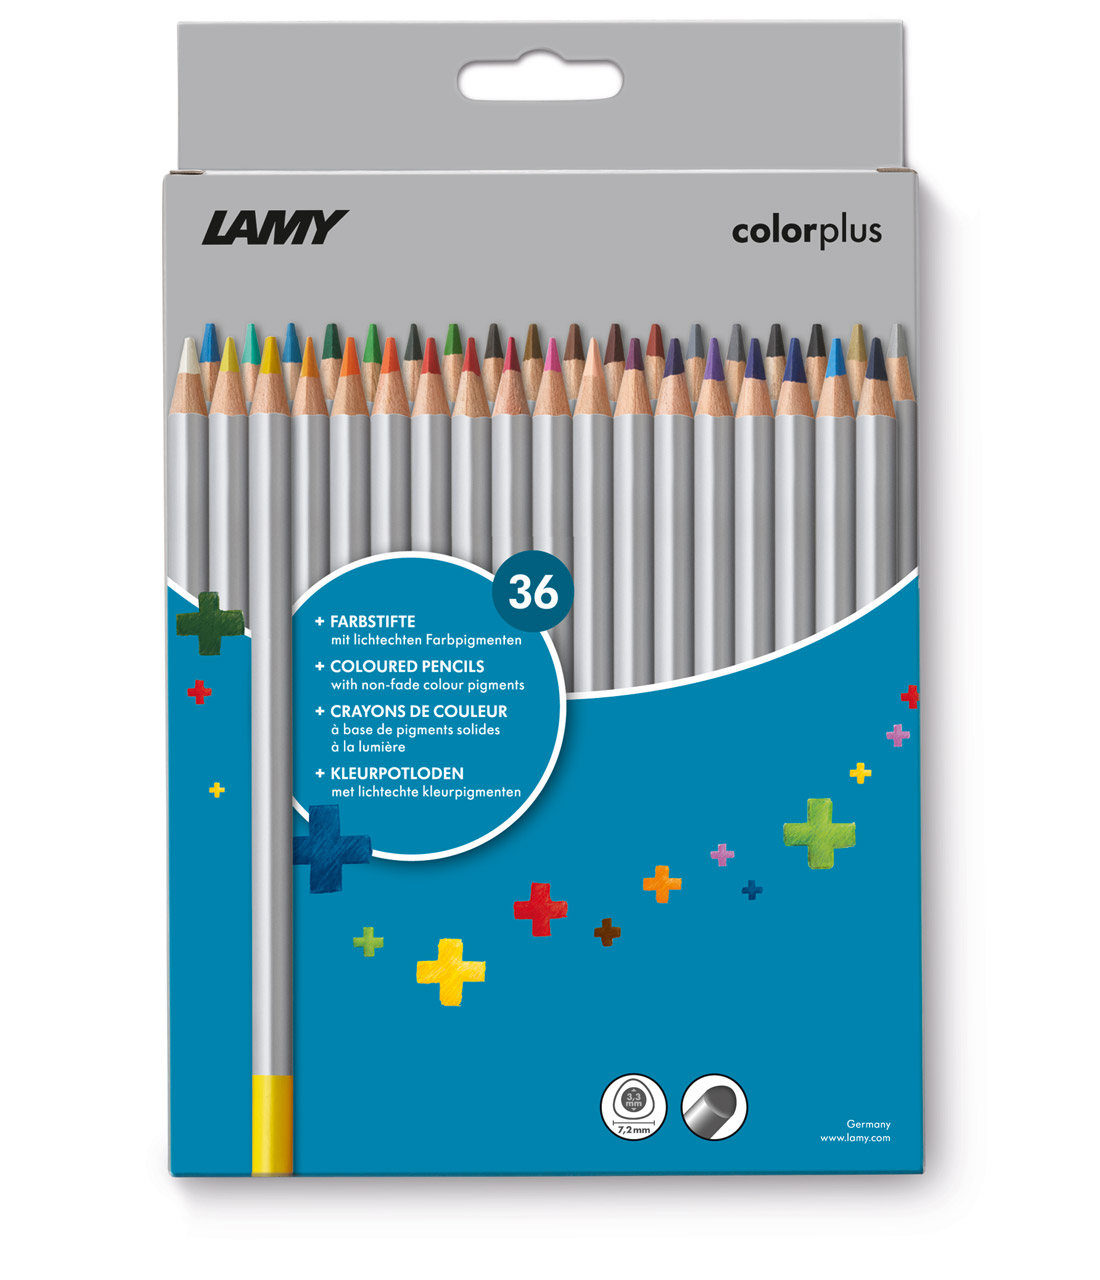 LAMY colorplus Farbstifte 36 Stück